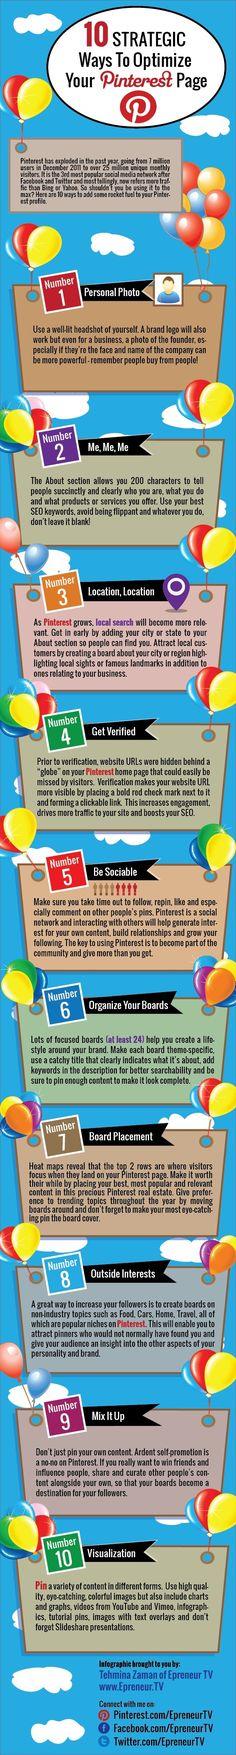 Pinterest strategy tips